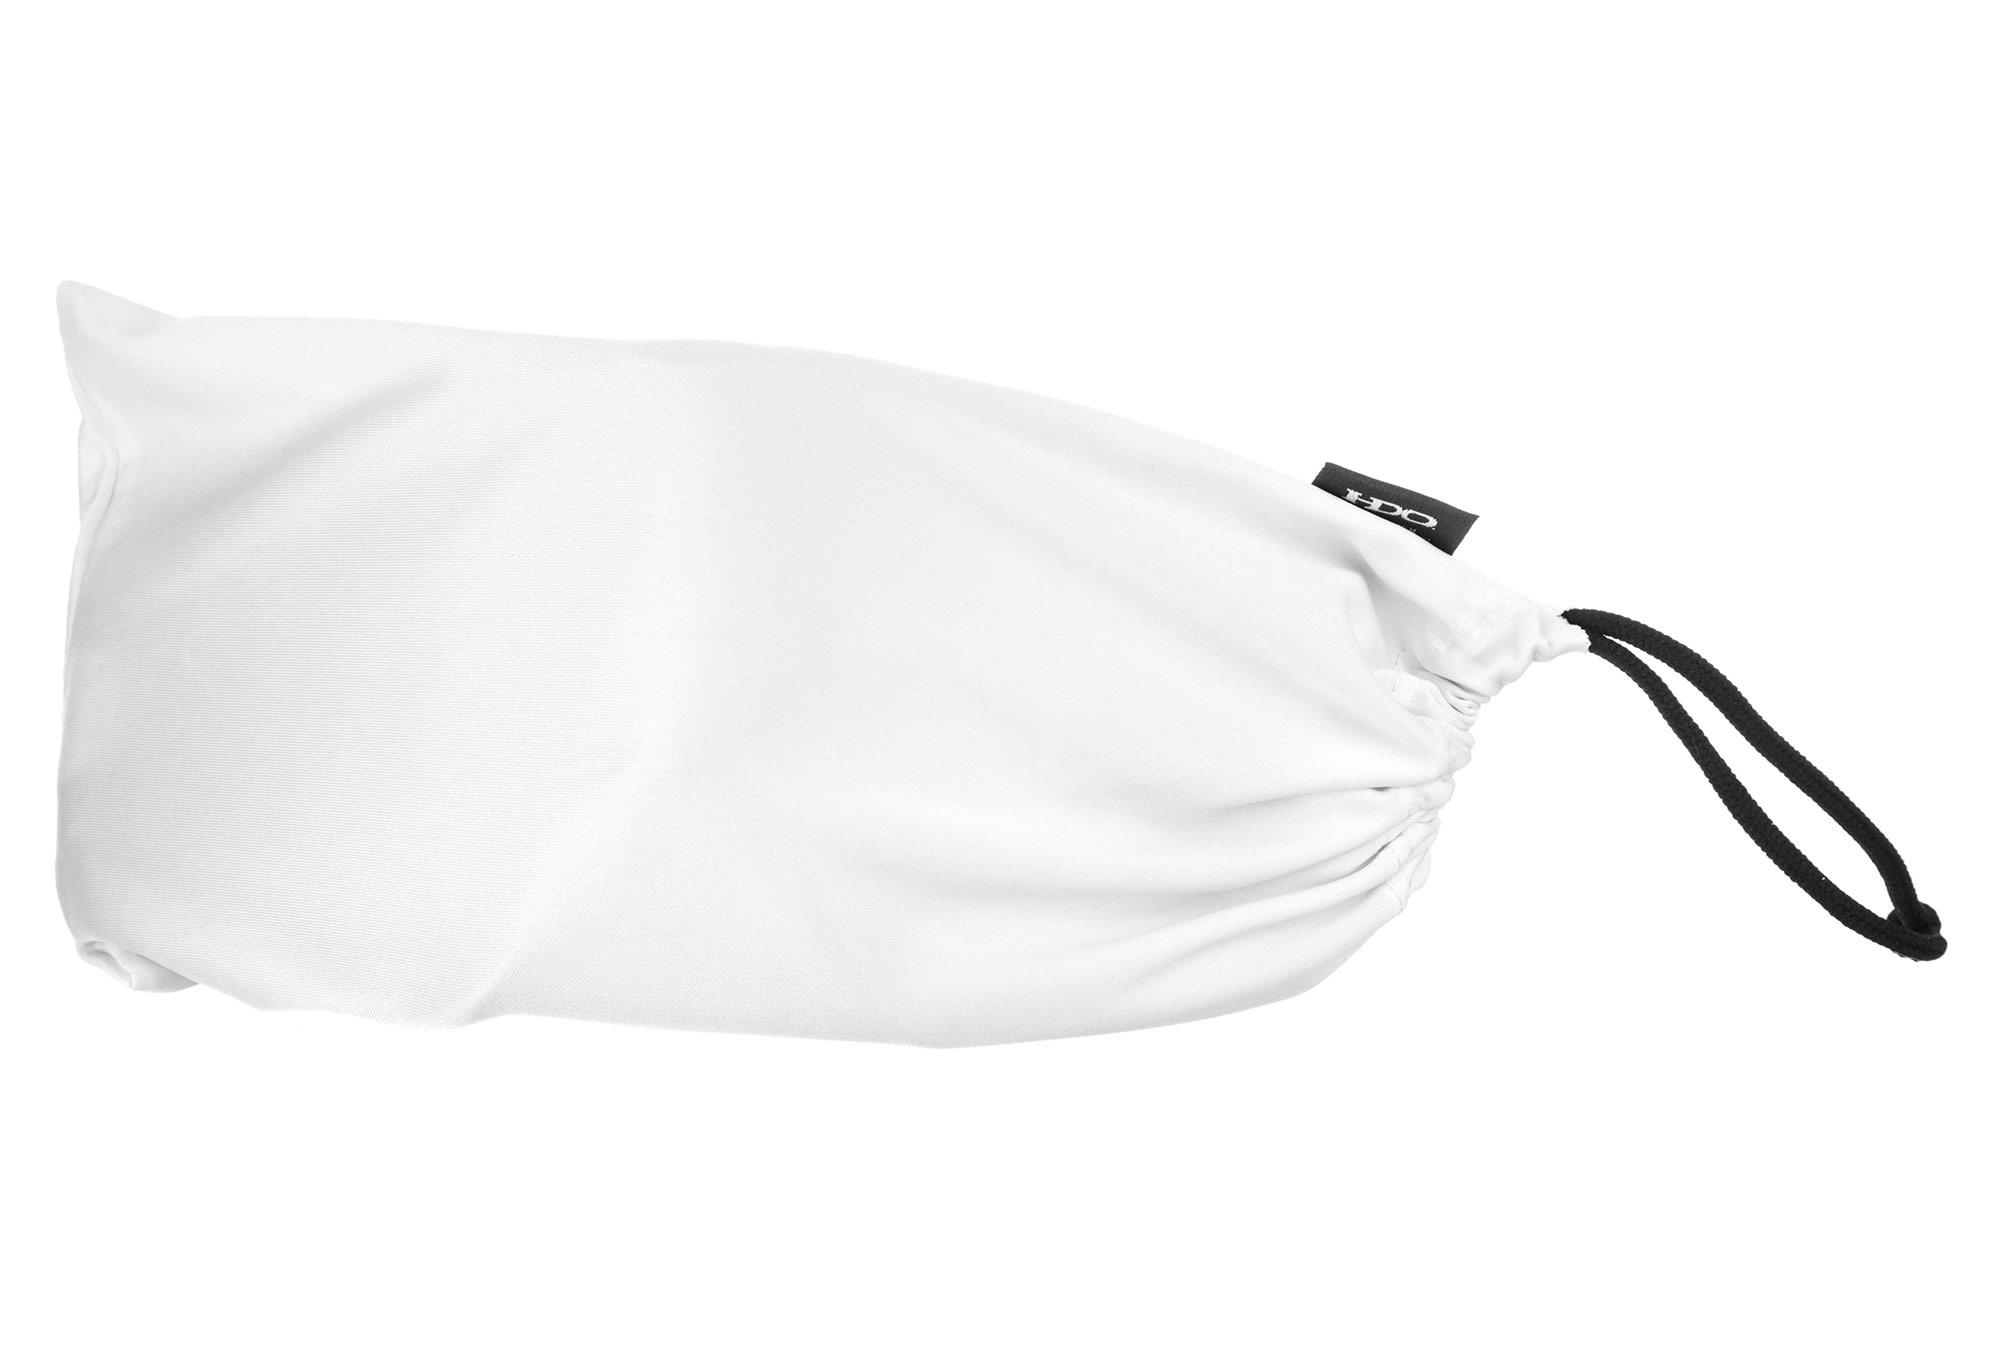 Maschera OAKLEY O-Frame MX Jet Nera - Lente Transparente 01-615 ... aee0931eda